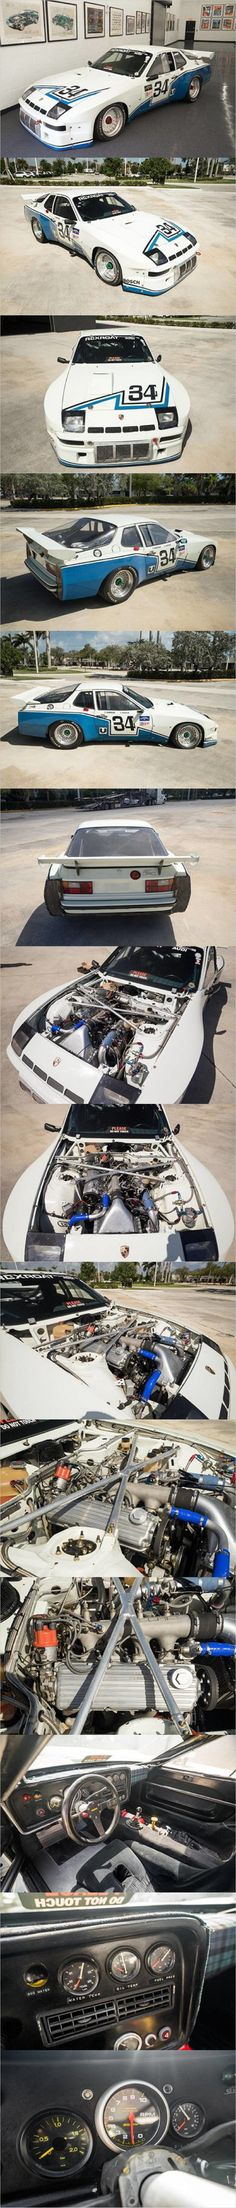 Porsche 924 GTR Porsche Classic, Classic Cars, Porsche 924, Water Coolers, Car Stuff, Cars And Motorcycles, Motors, Engine, Trucks